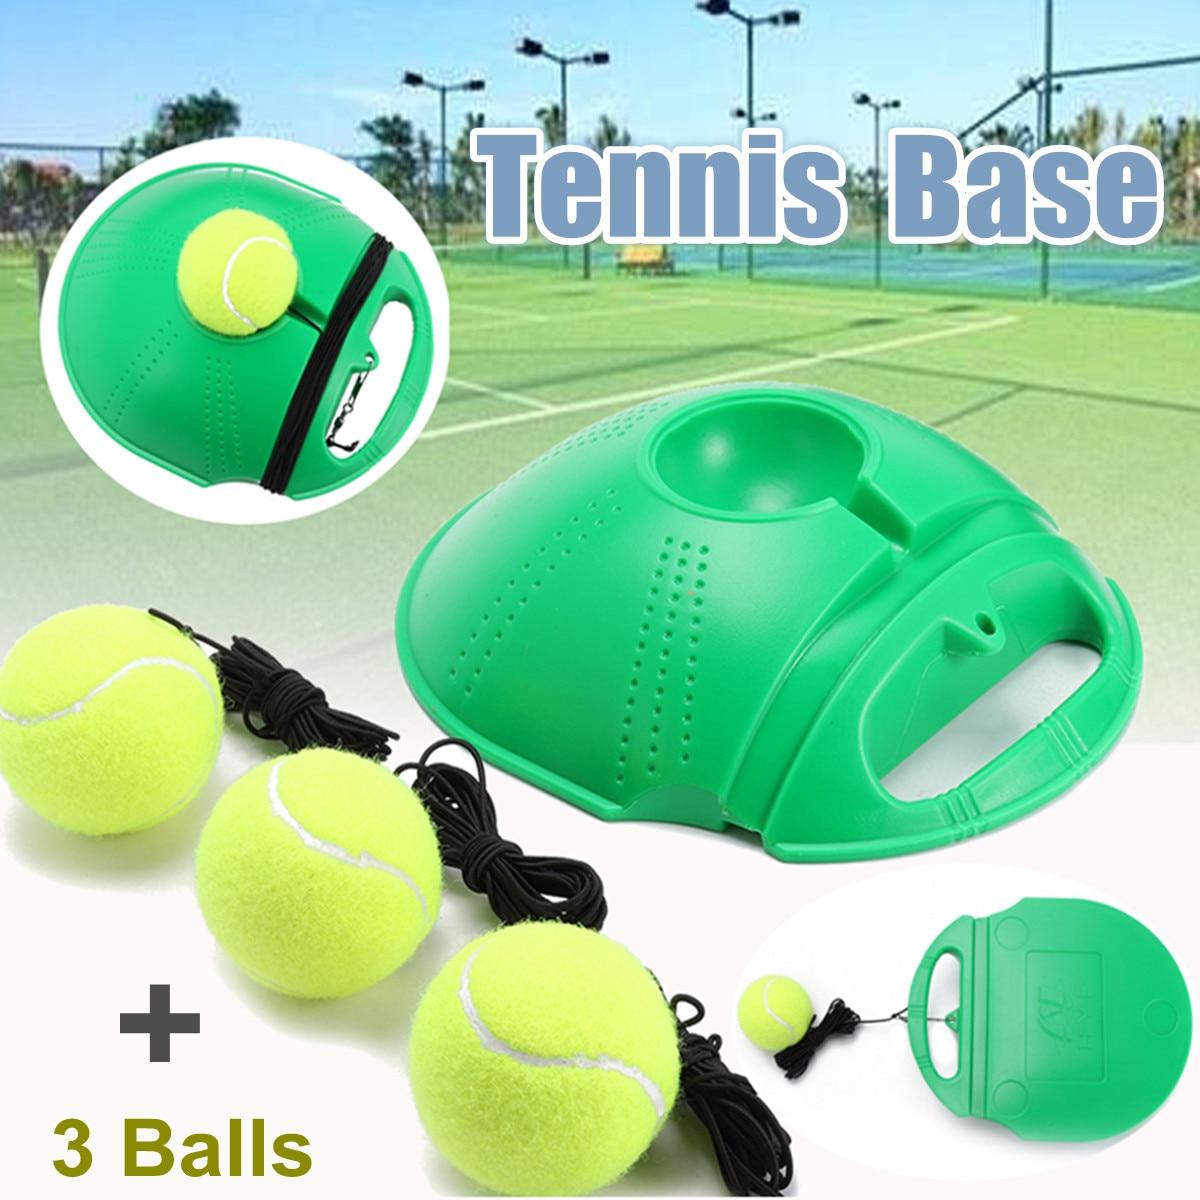 Single Tennis Trainer Self-study Tennis Training Tool Rebound Balls Baseboard Tools Tennis Practice Portable With 3 Balls